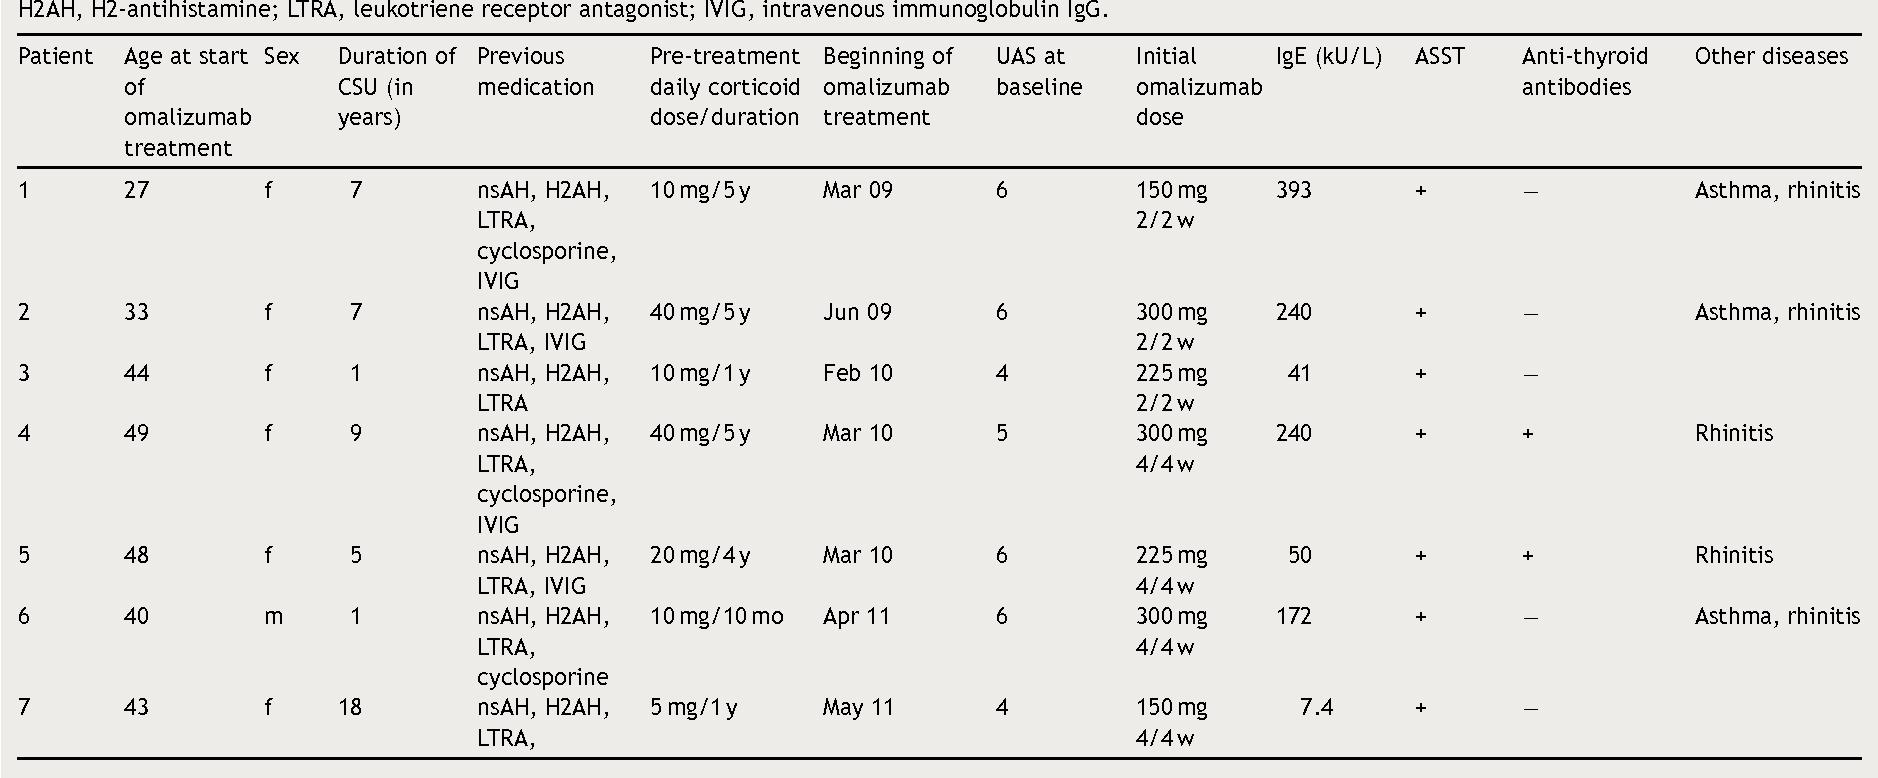 Non sedating anti-h1 antihistamines for hives